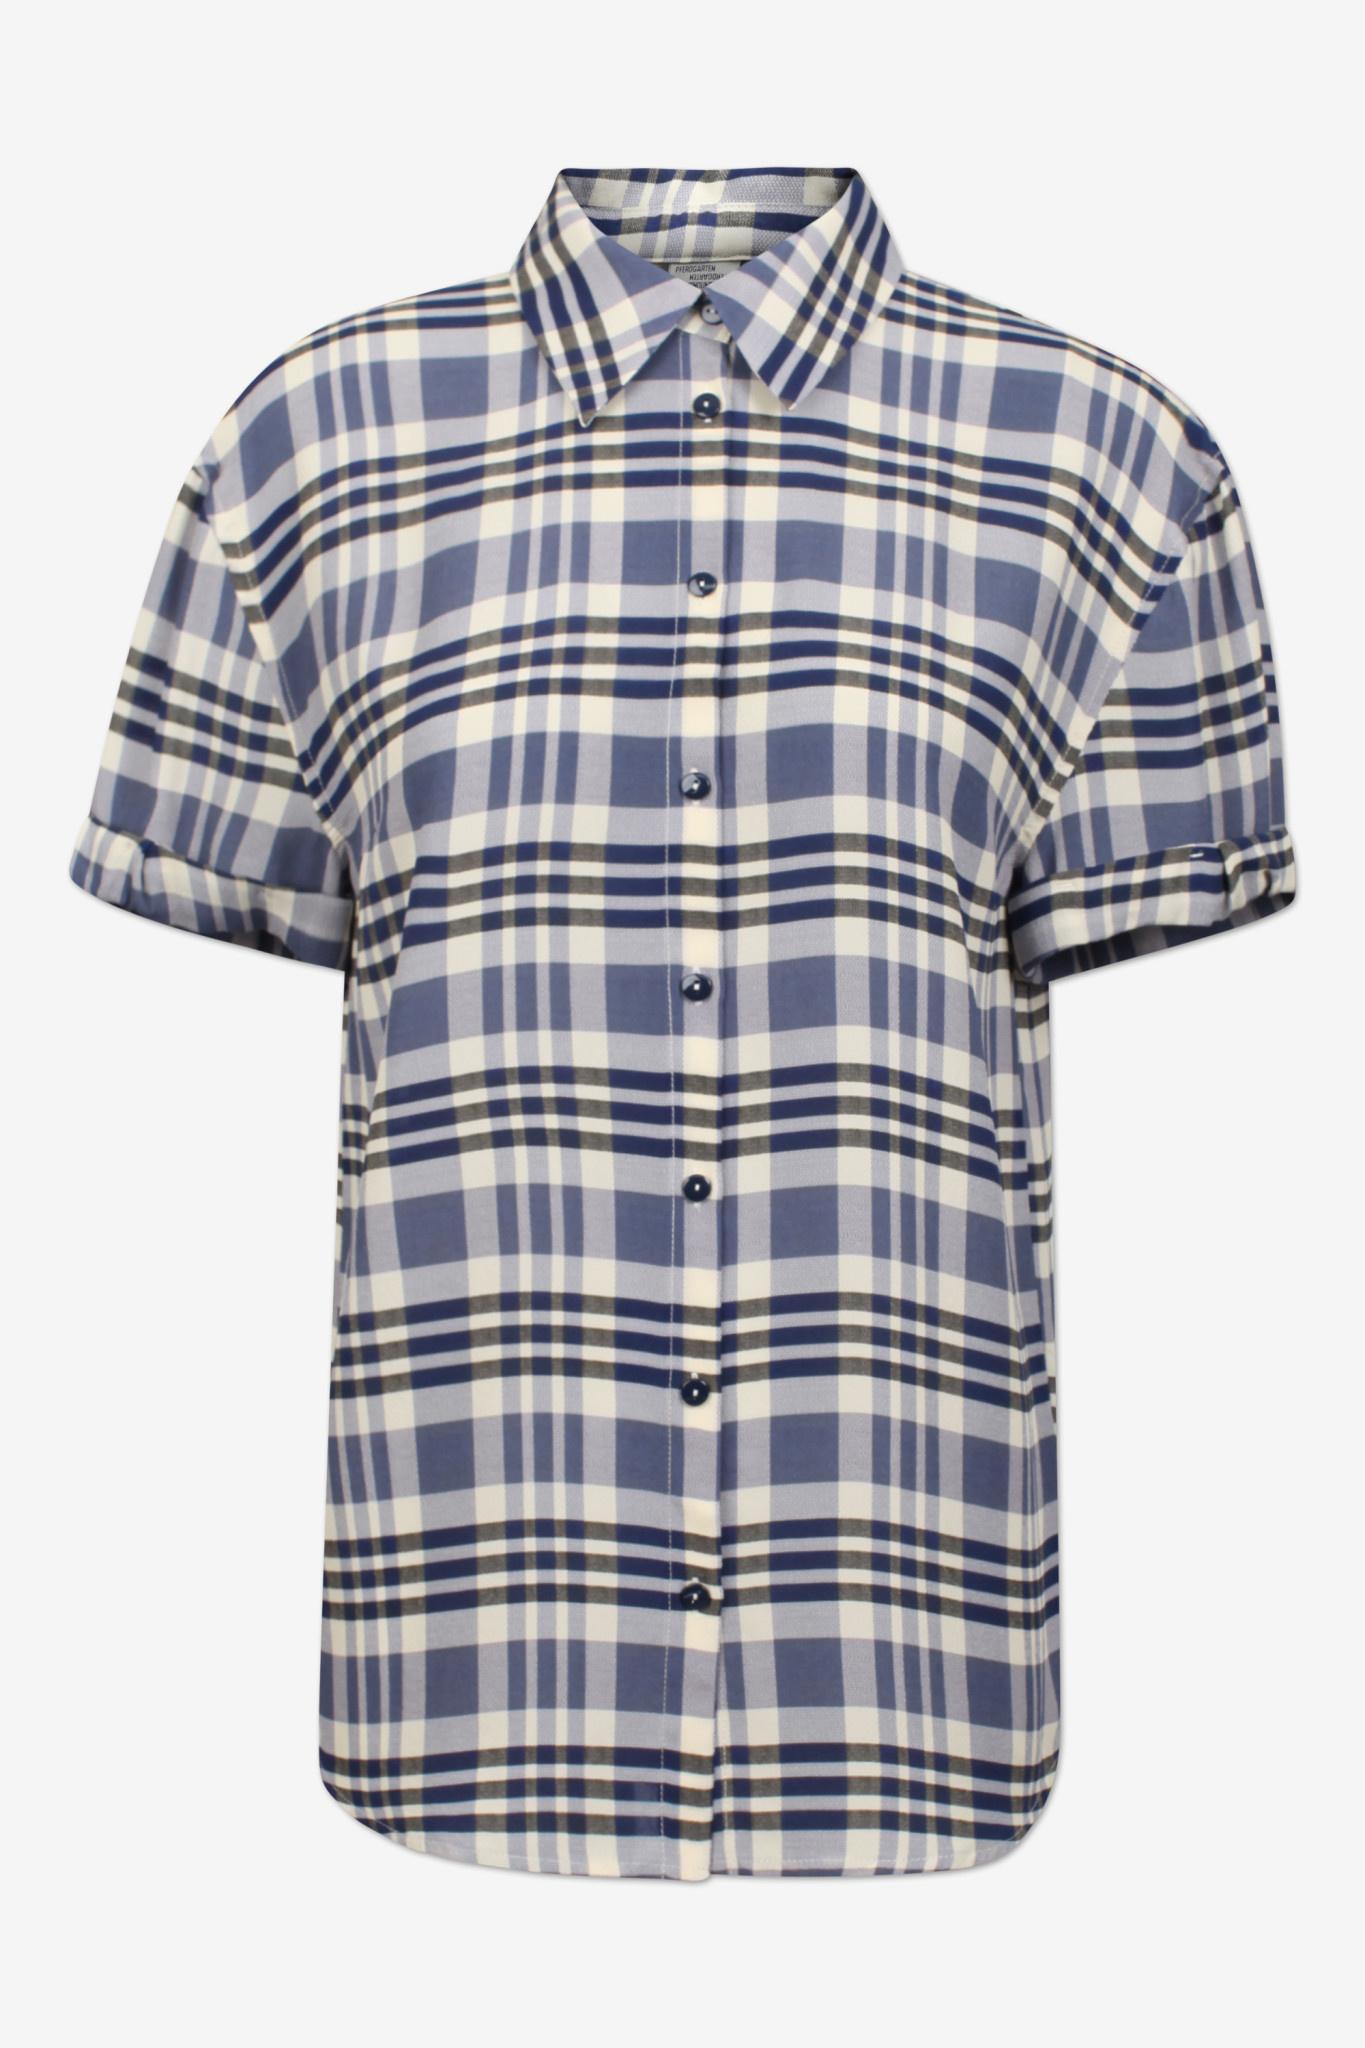 Moanna blouse check-1